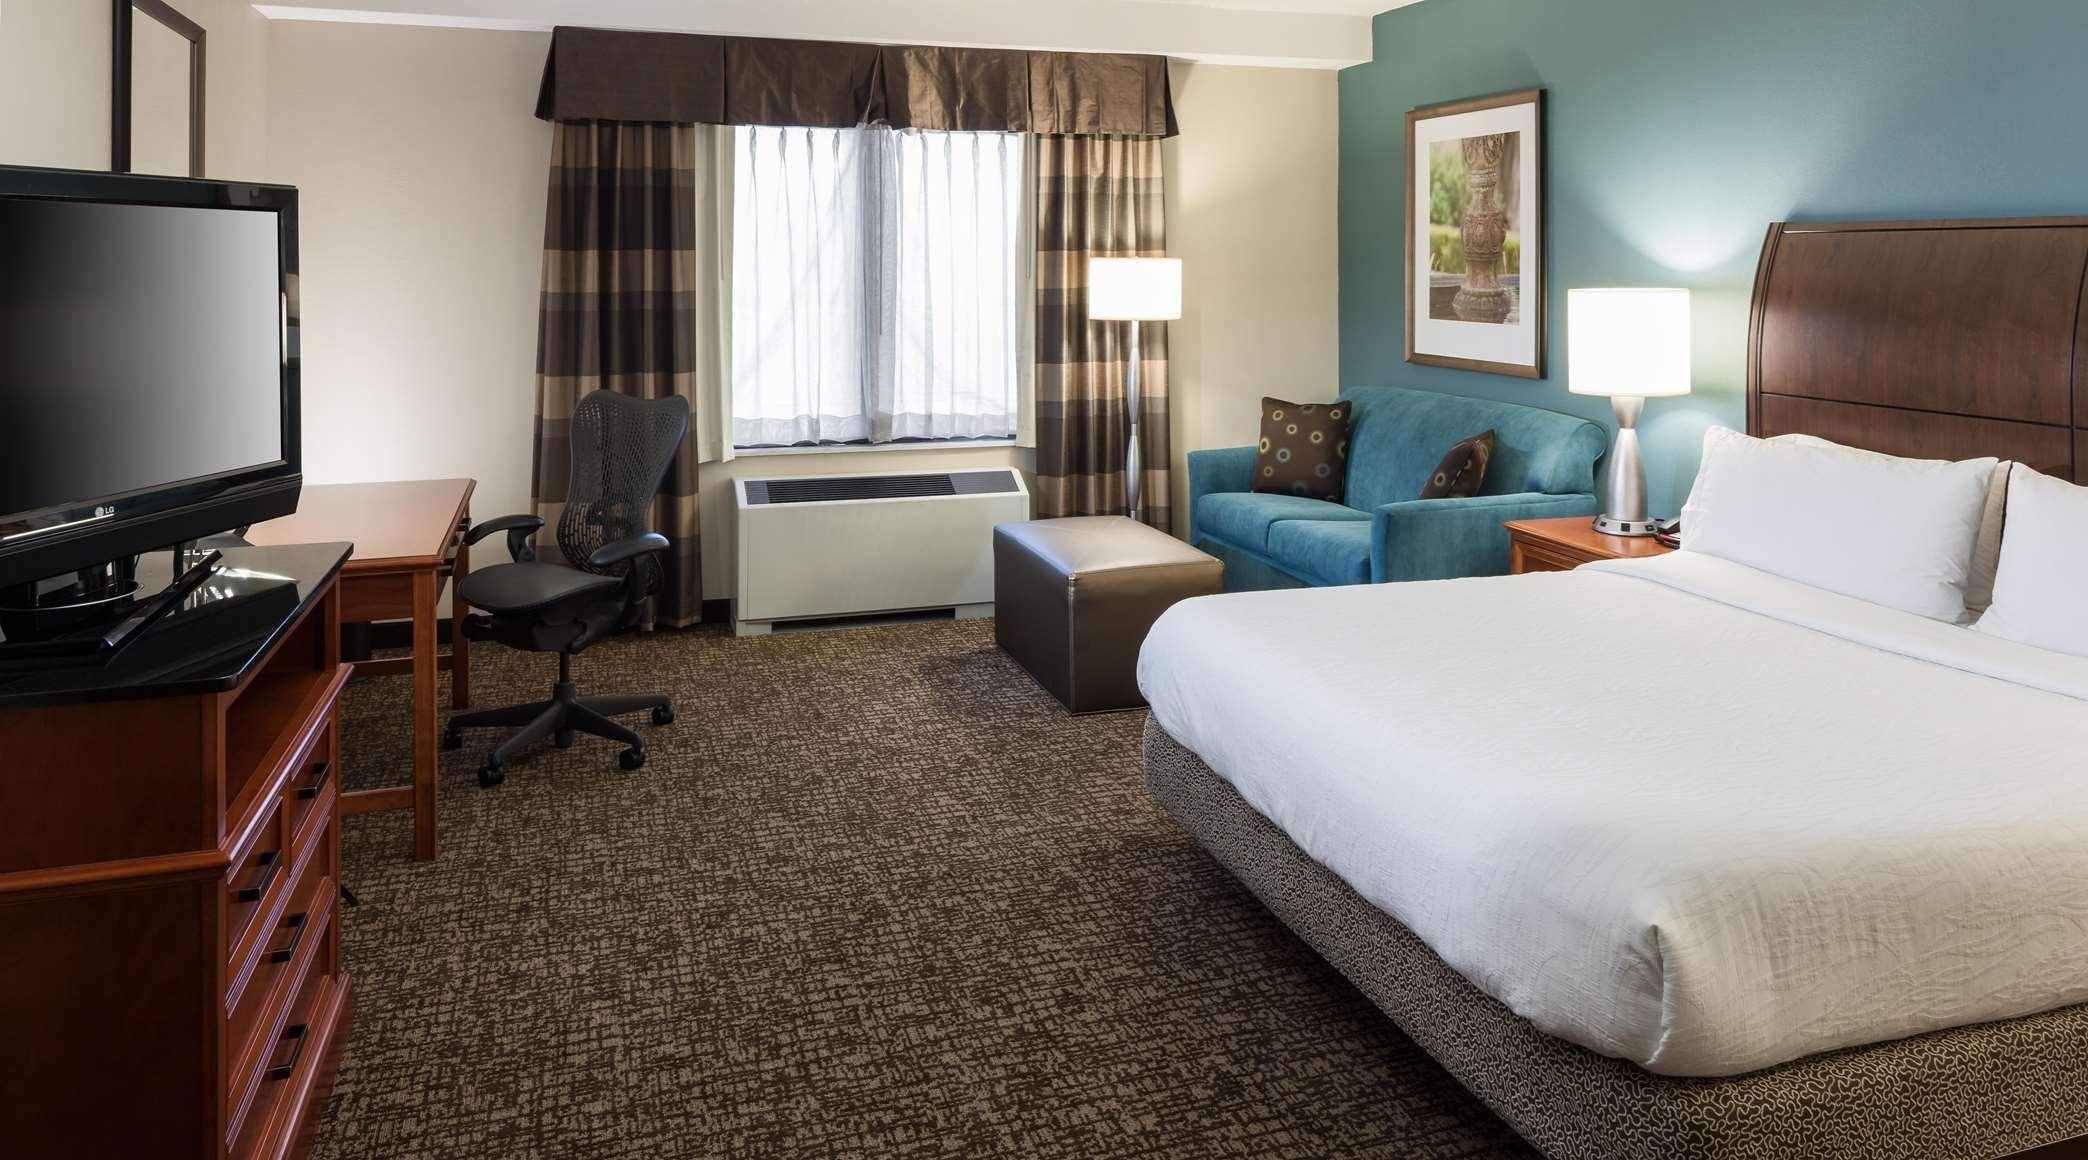 Hilton Garden Inn Rockaway image 16